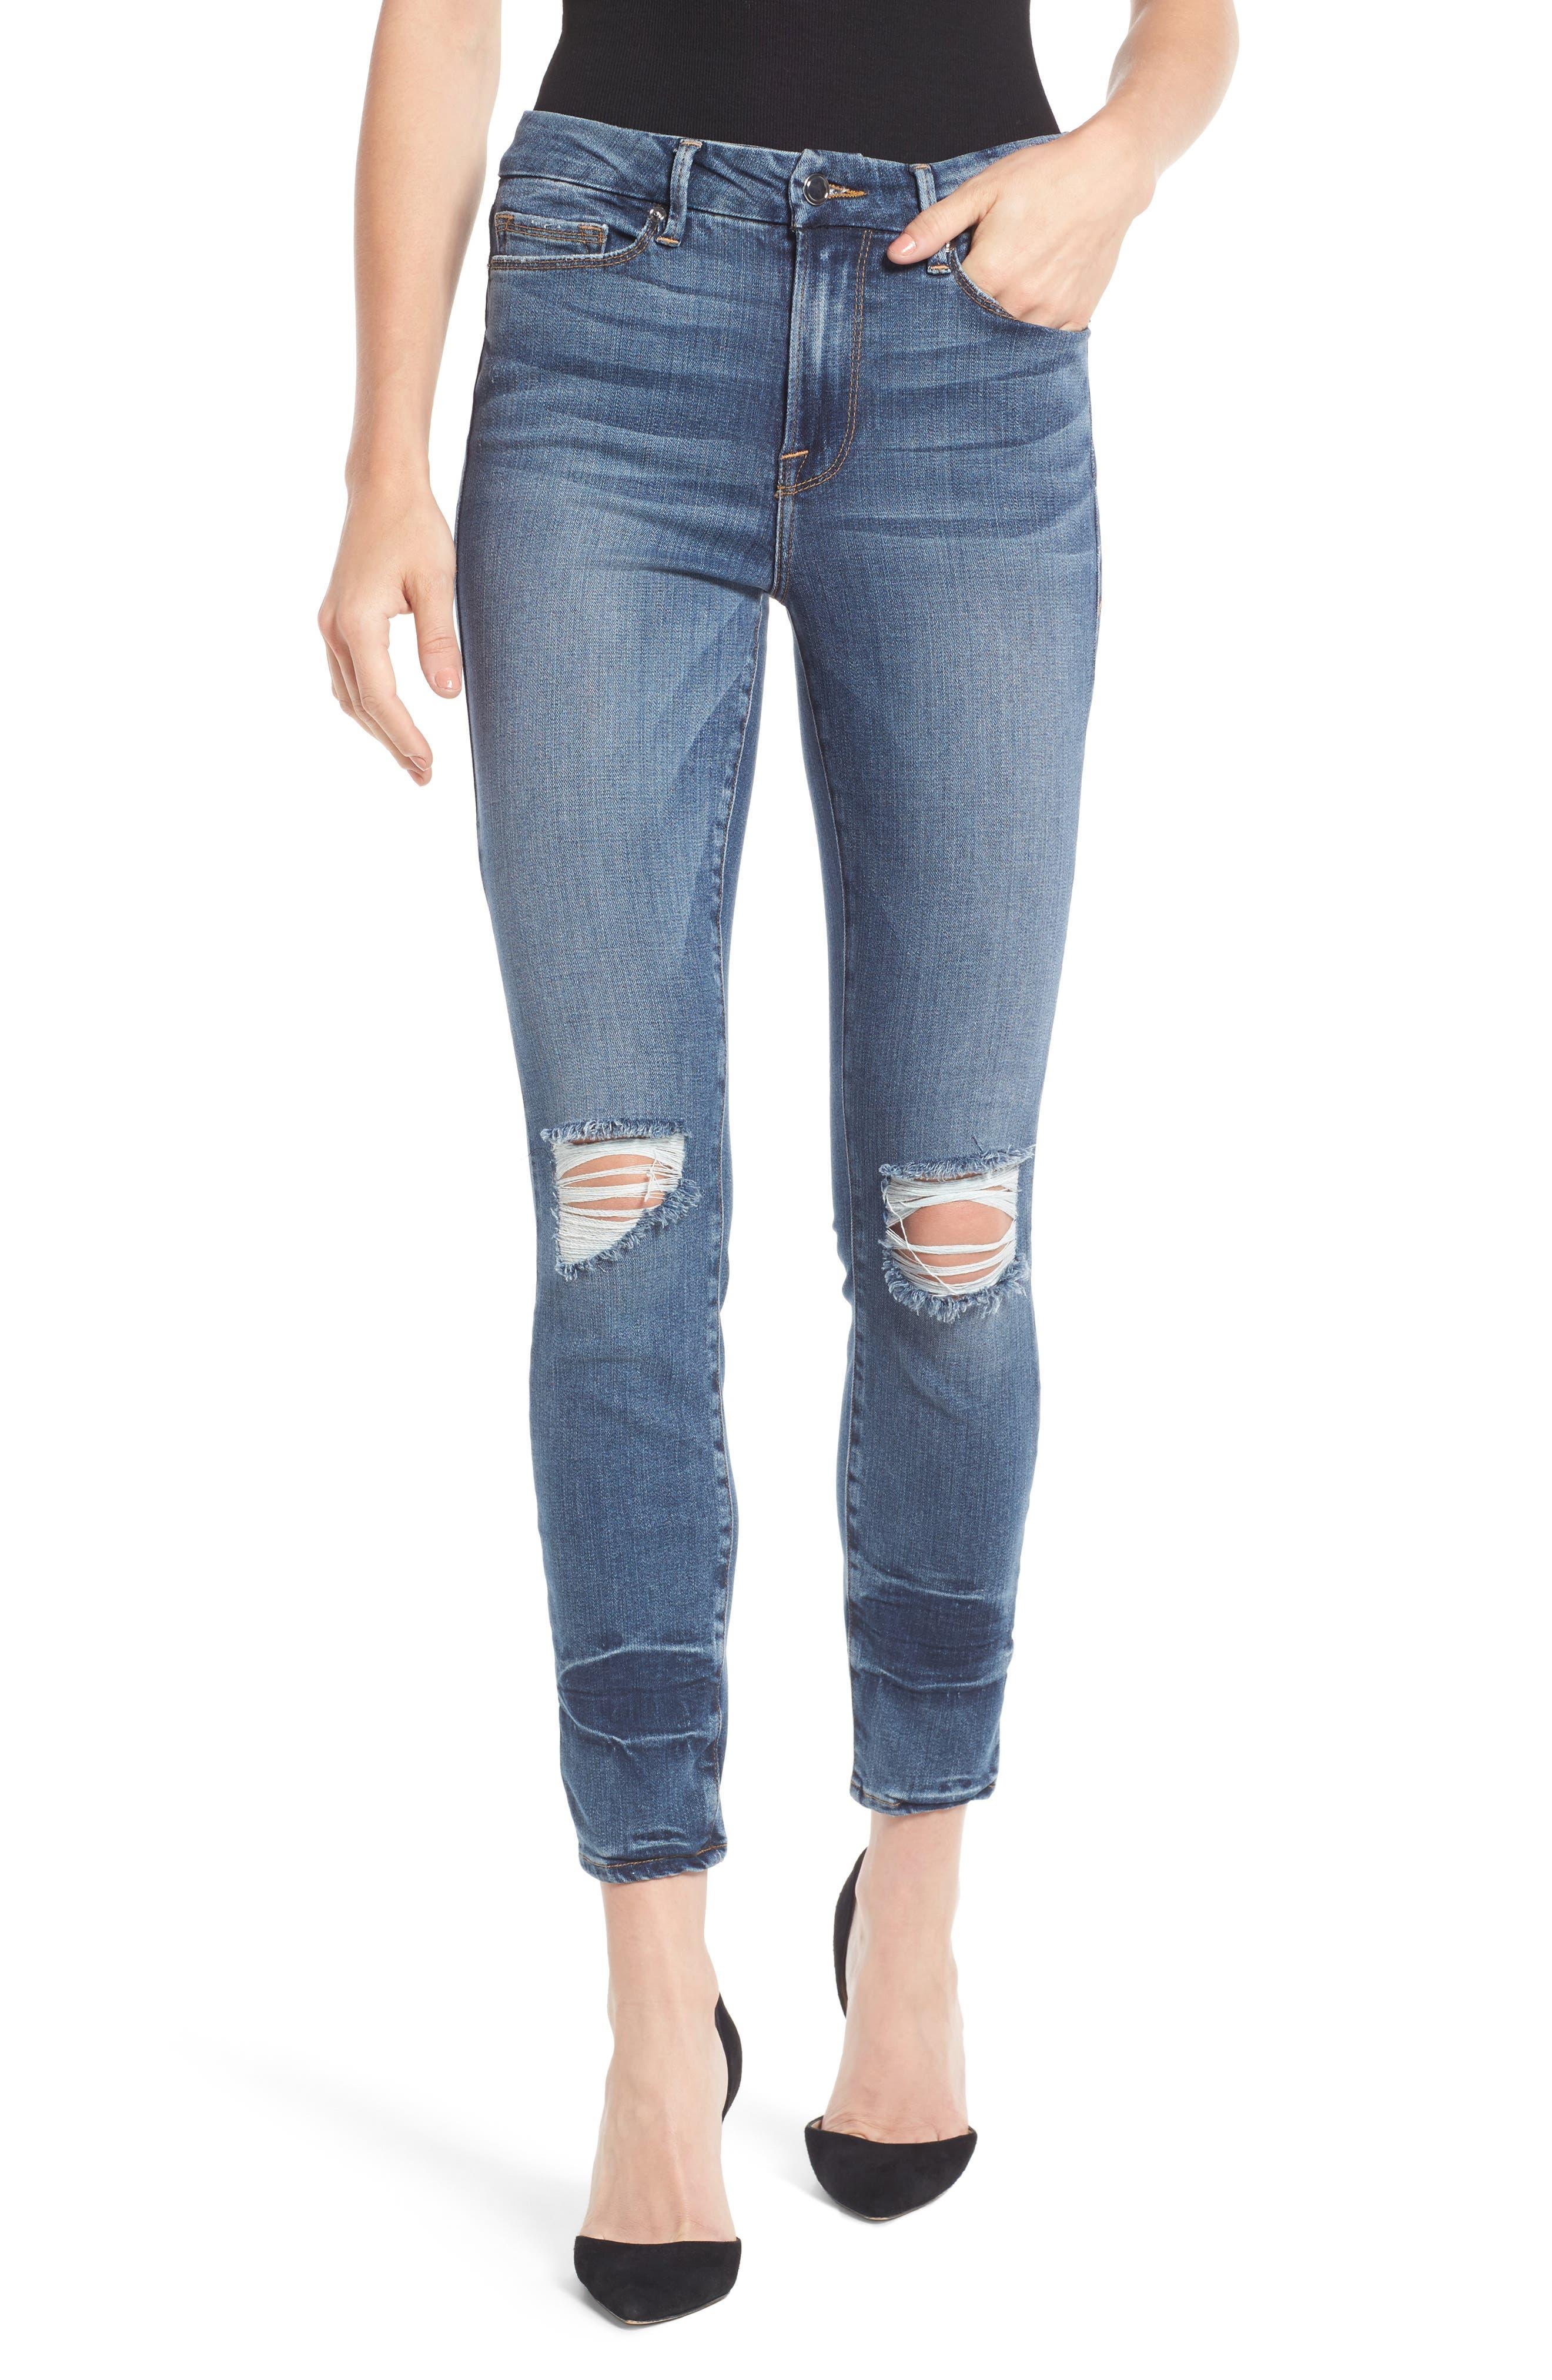 Main Image - Good American Good Legs High Waist Ankle Skinny Jeans (Blue 084) (Regular & Plus Size)